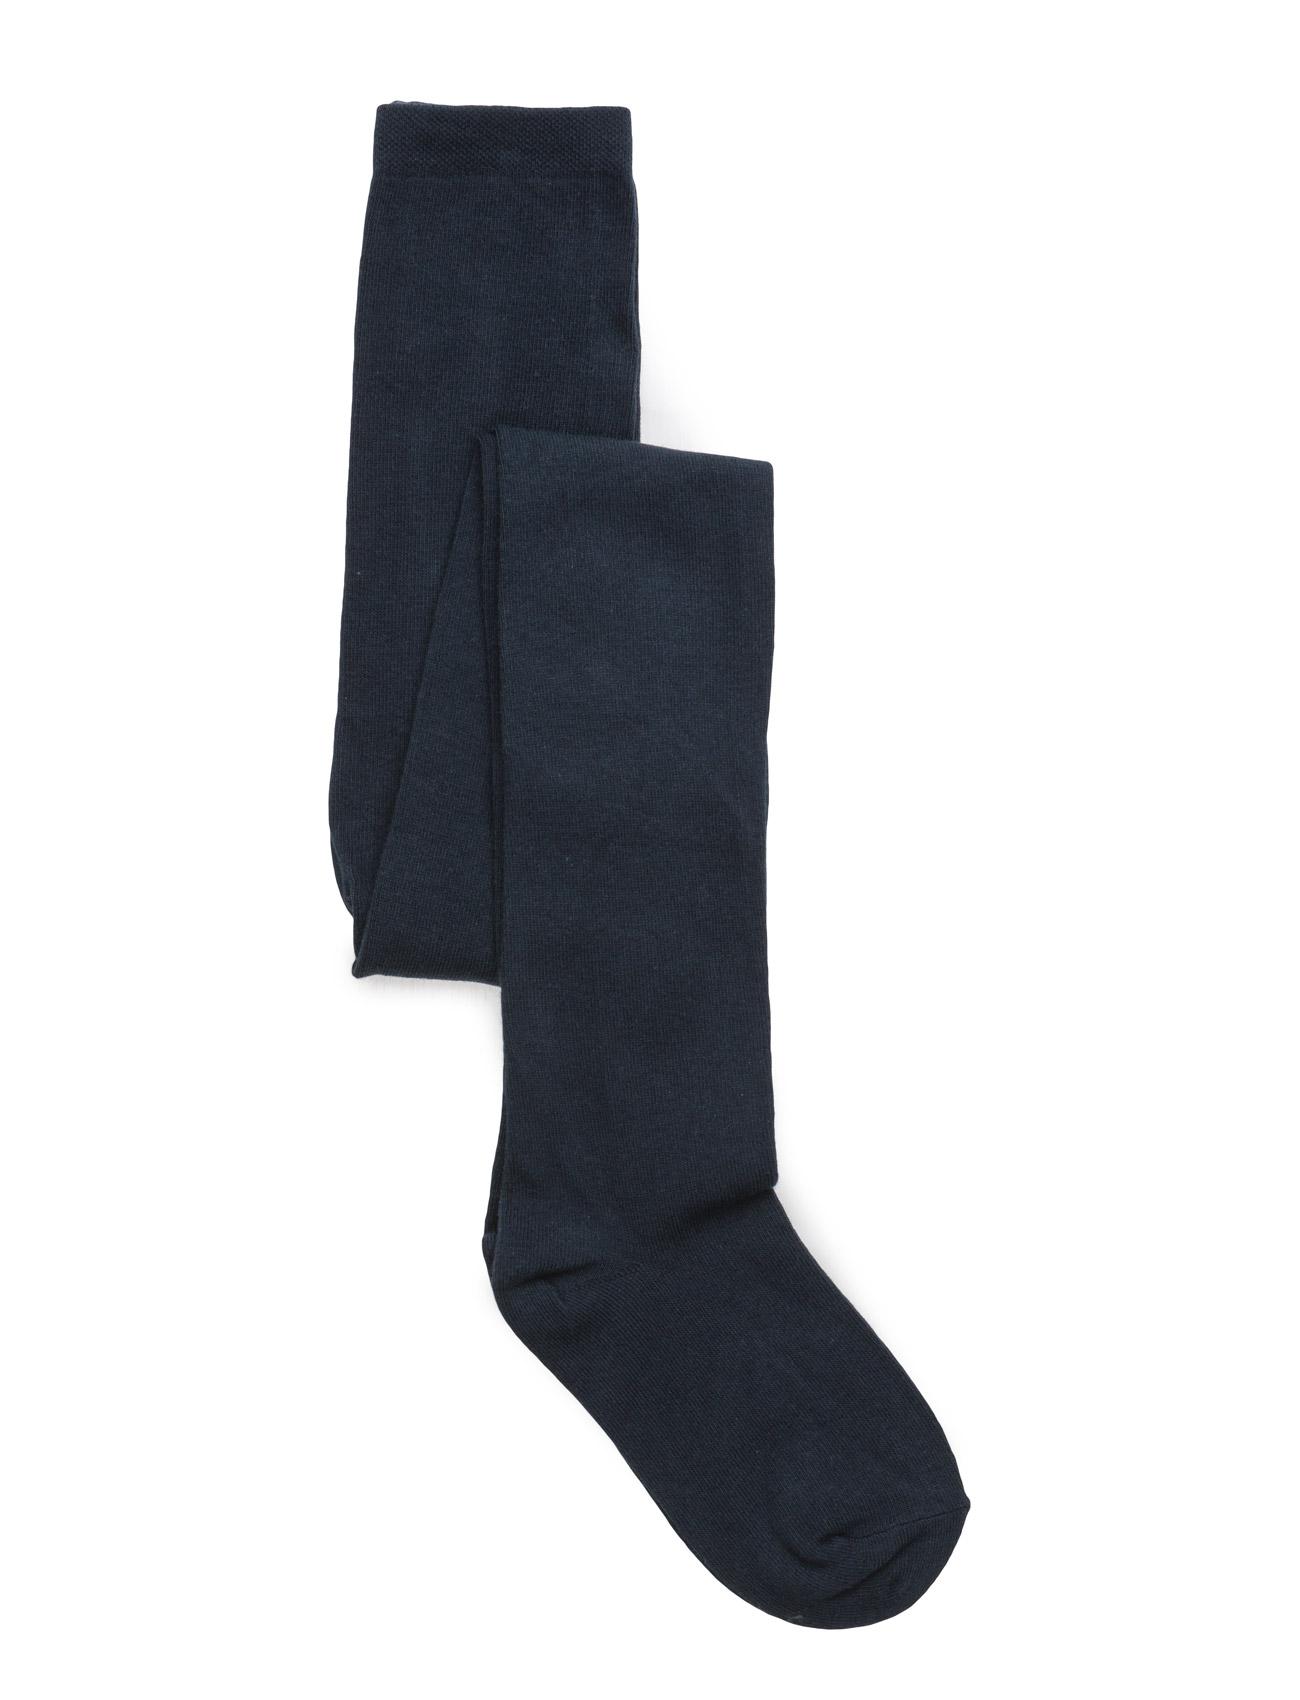 Image of Tight, Plain Colour Girls Socks & Tights Tights Blå MELTON (2382480777)